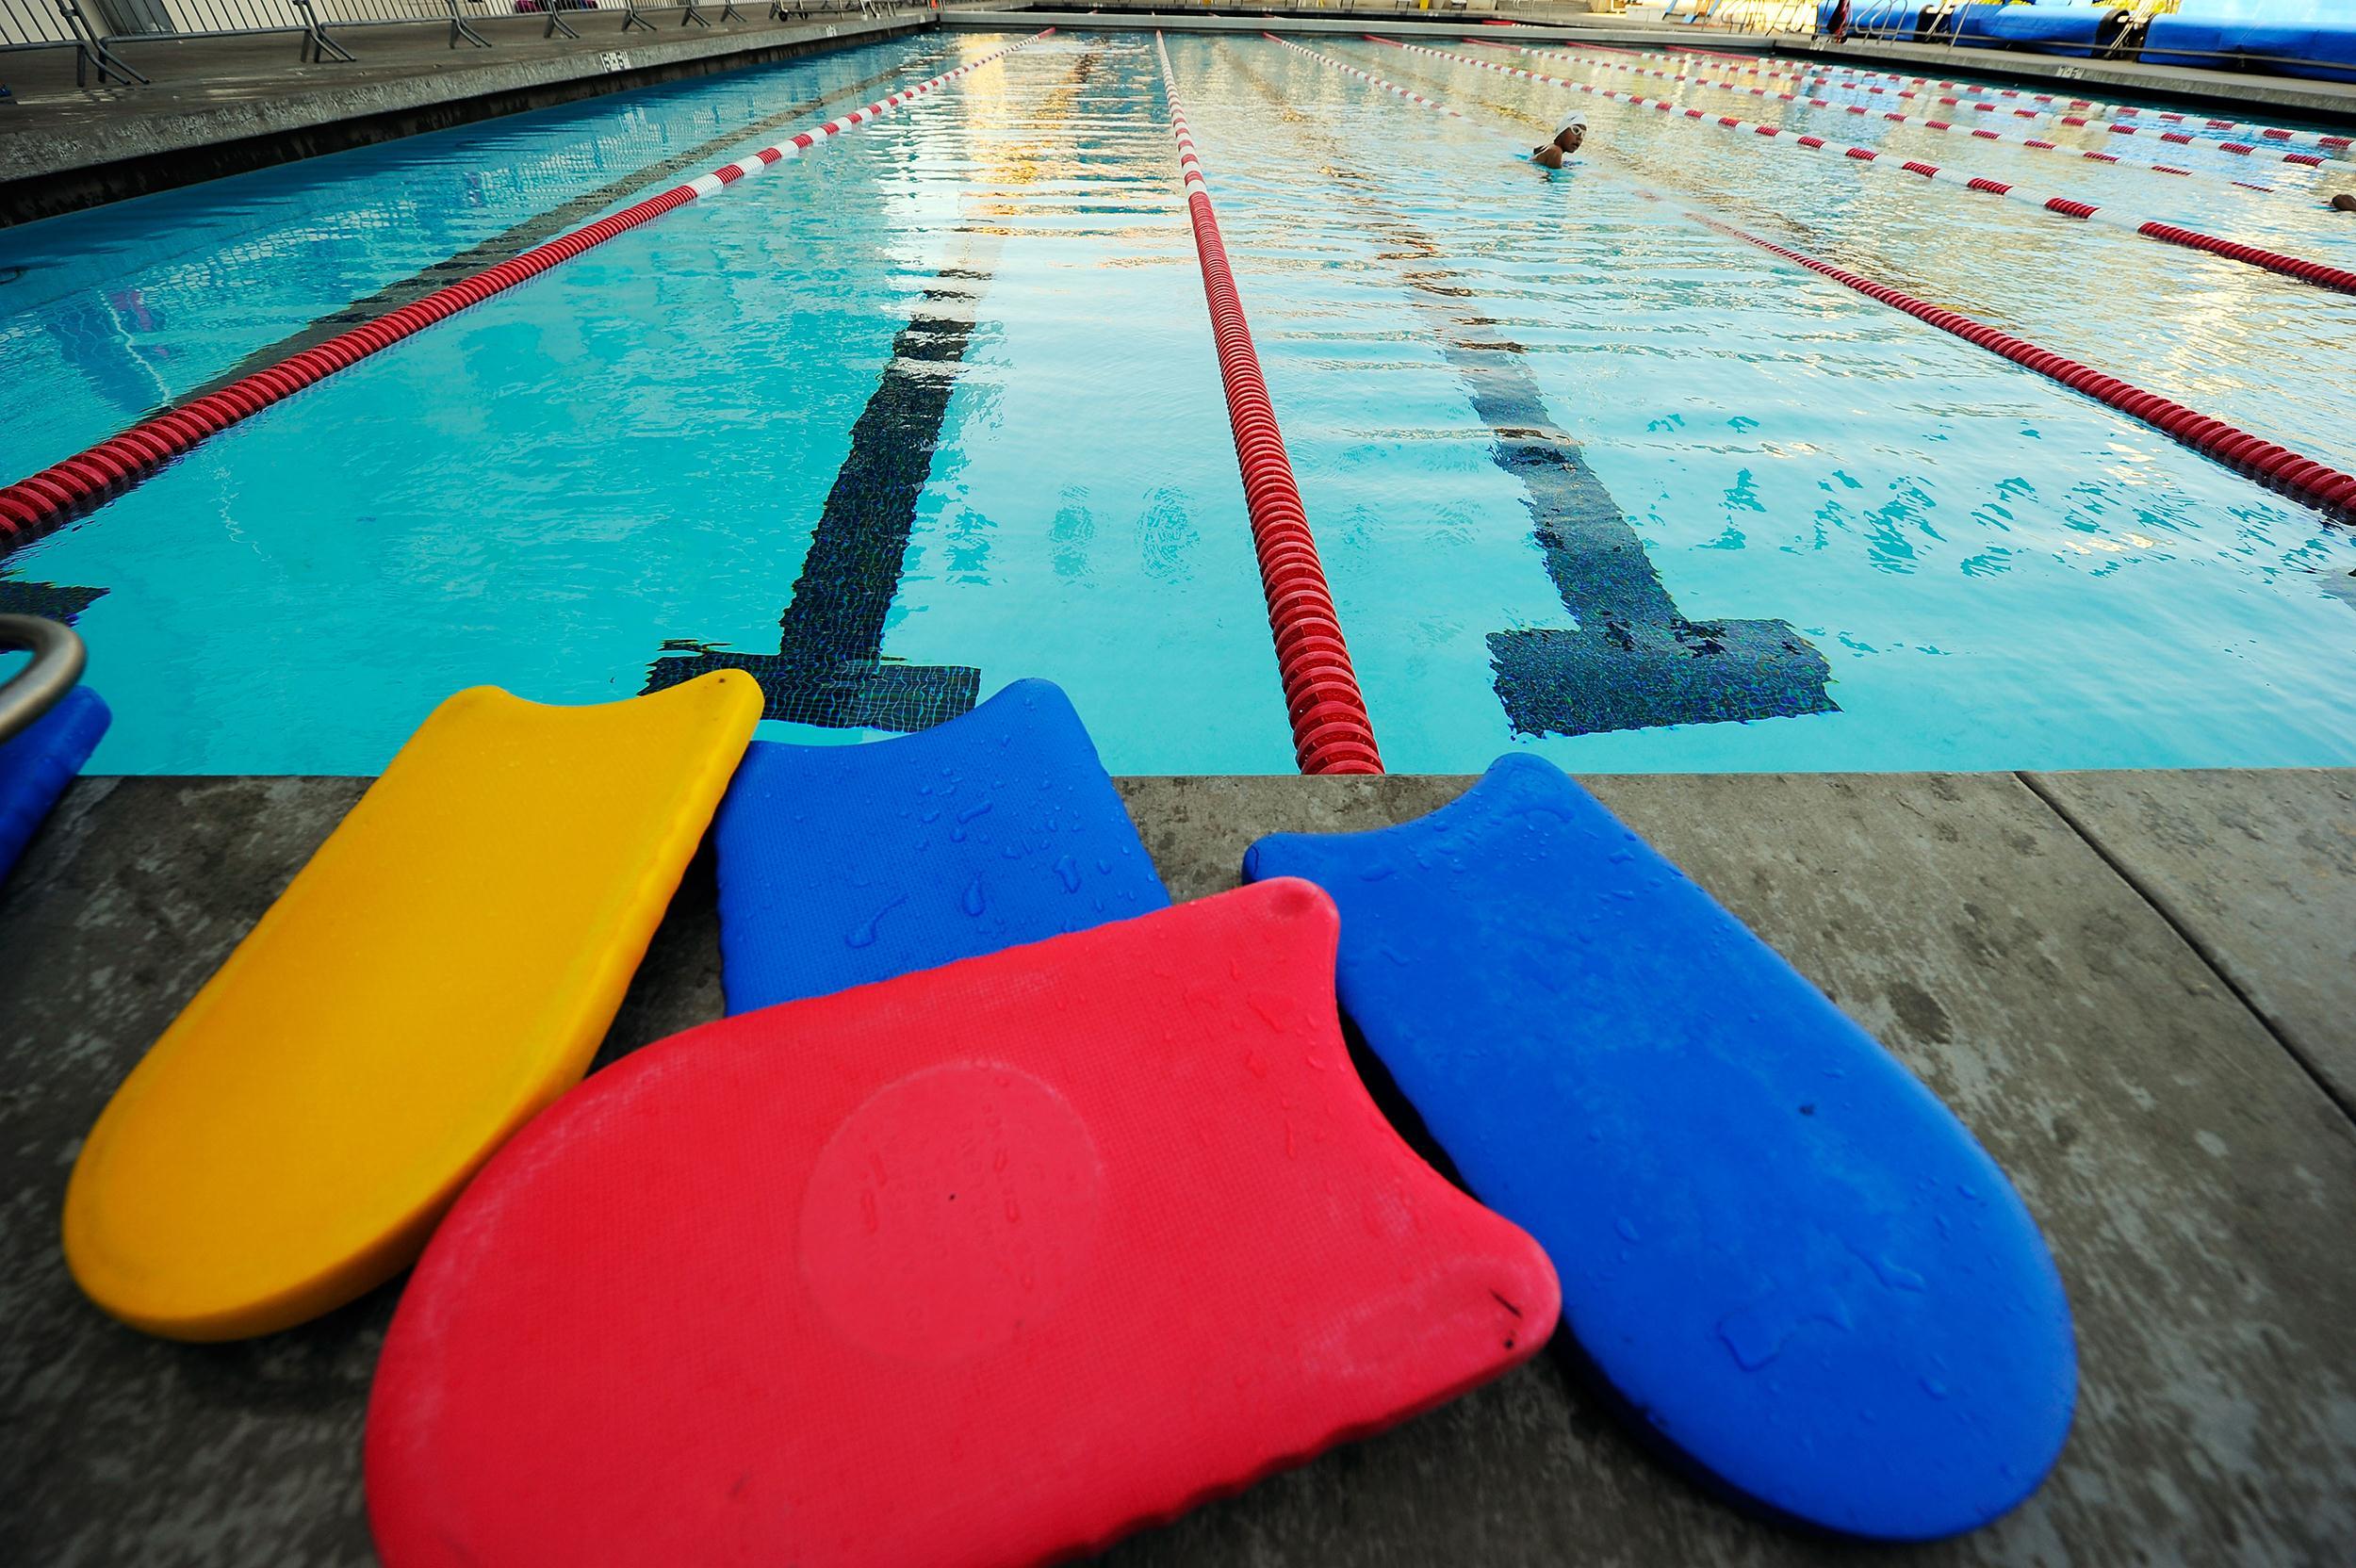 Image: A swimming pool